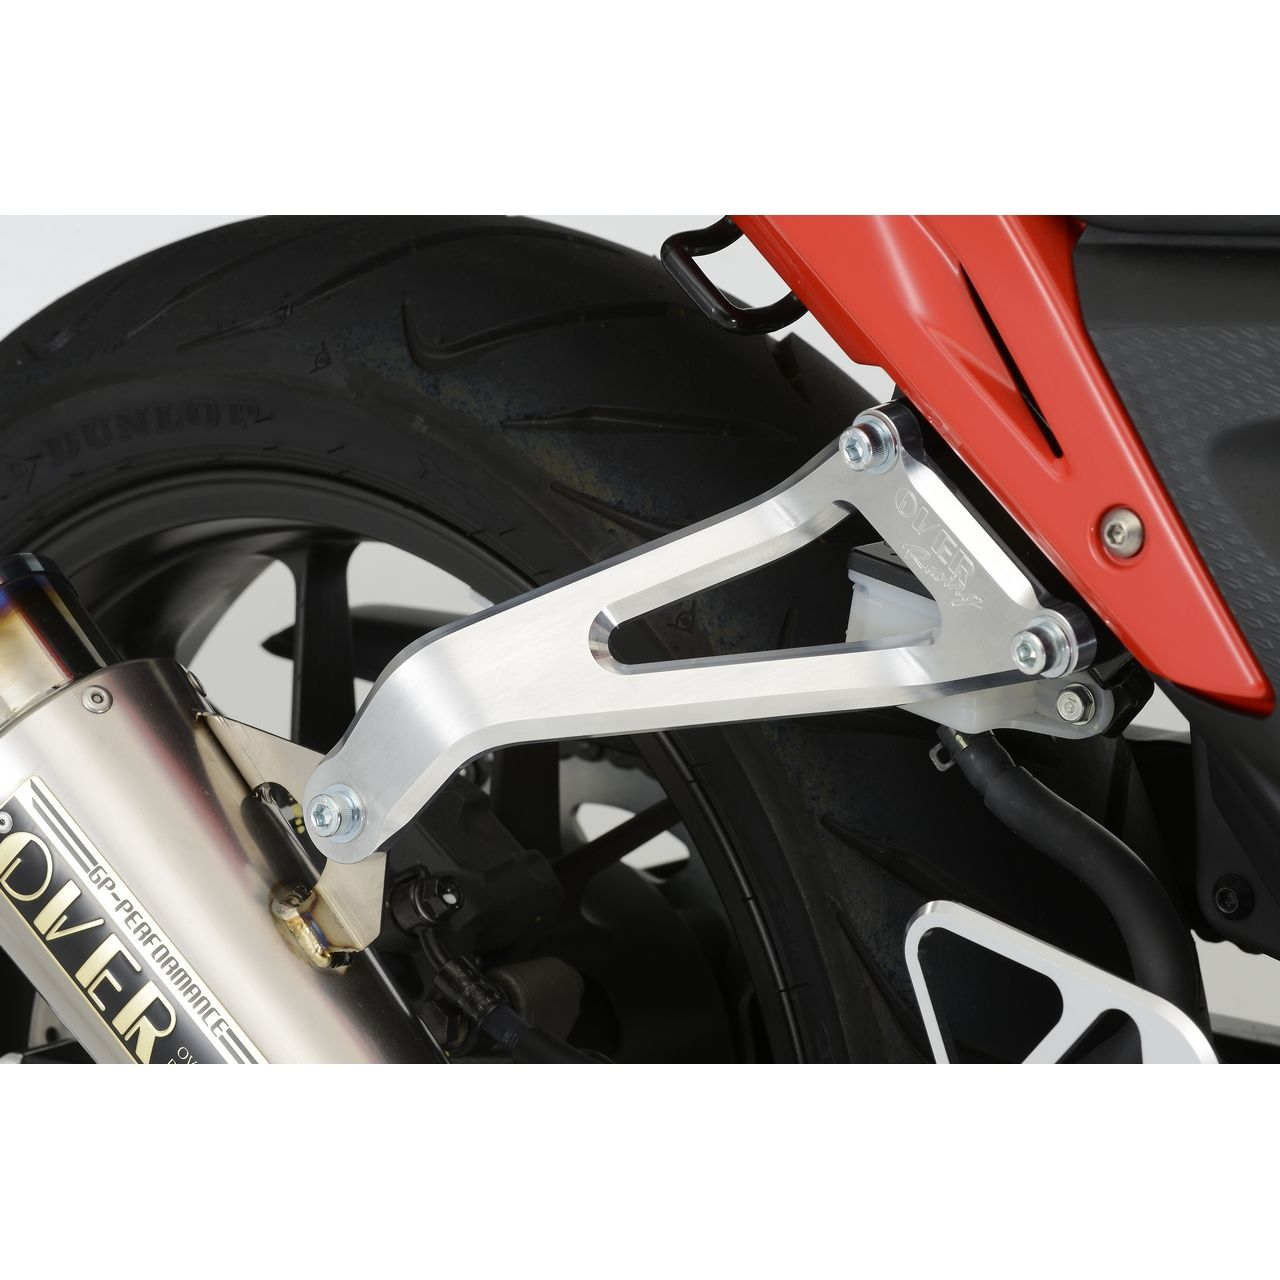 【OVER】鋁合金 Billet 排氣管固定架 - 「Webike-摩托百貨」